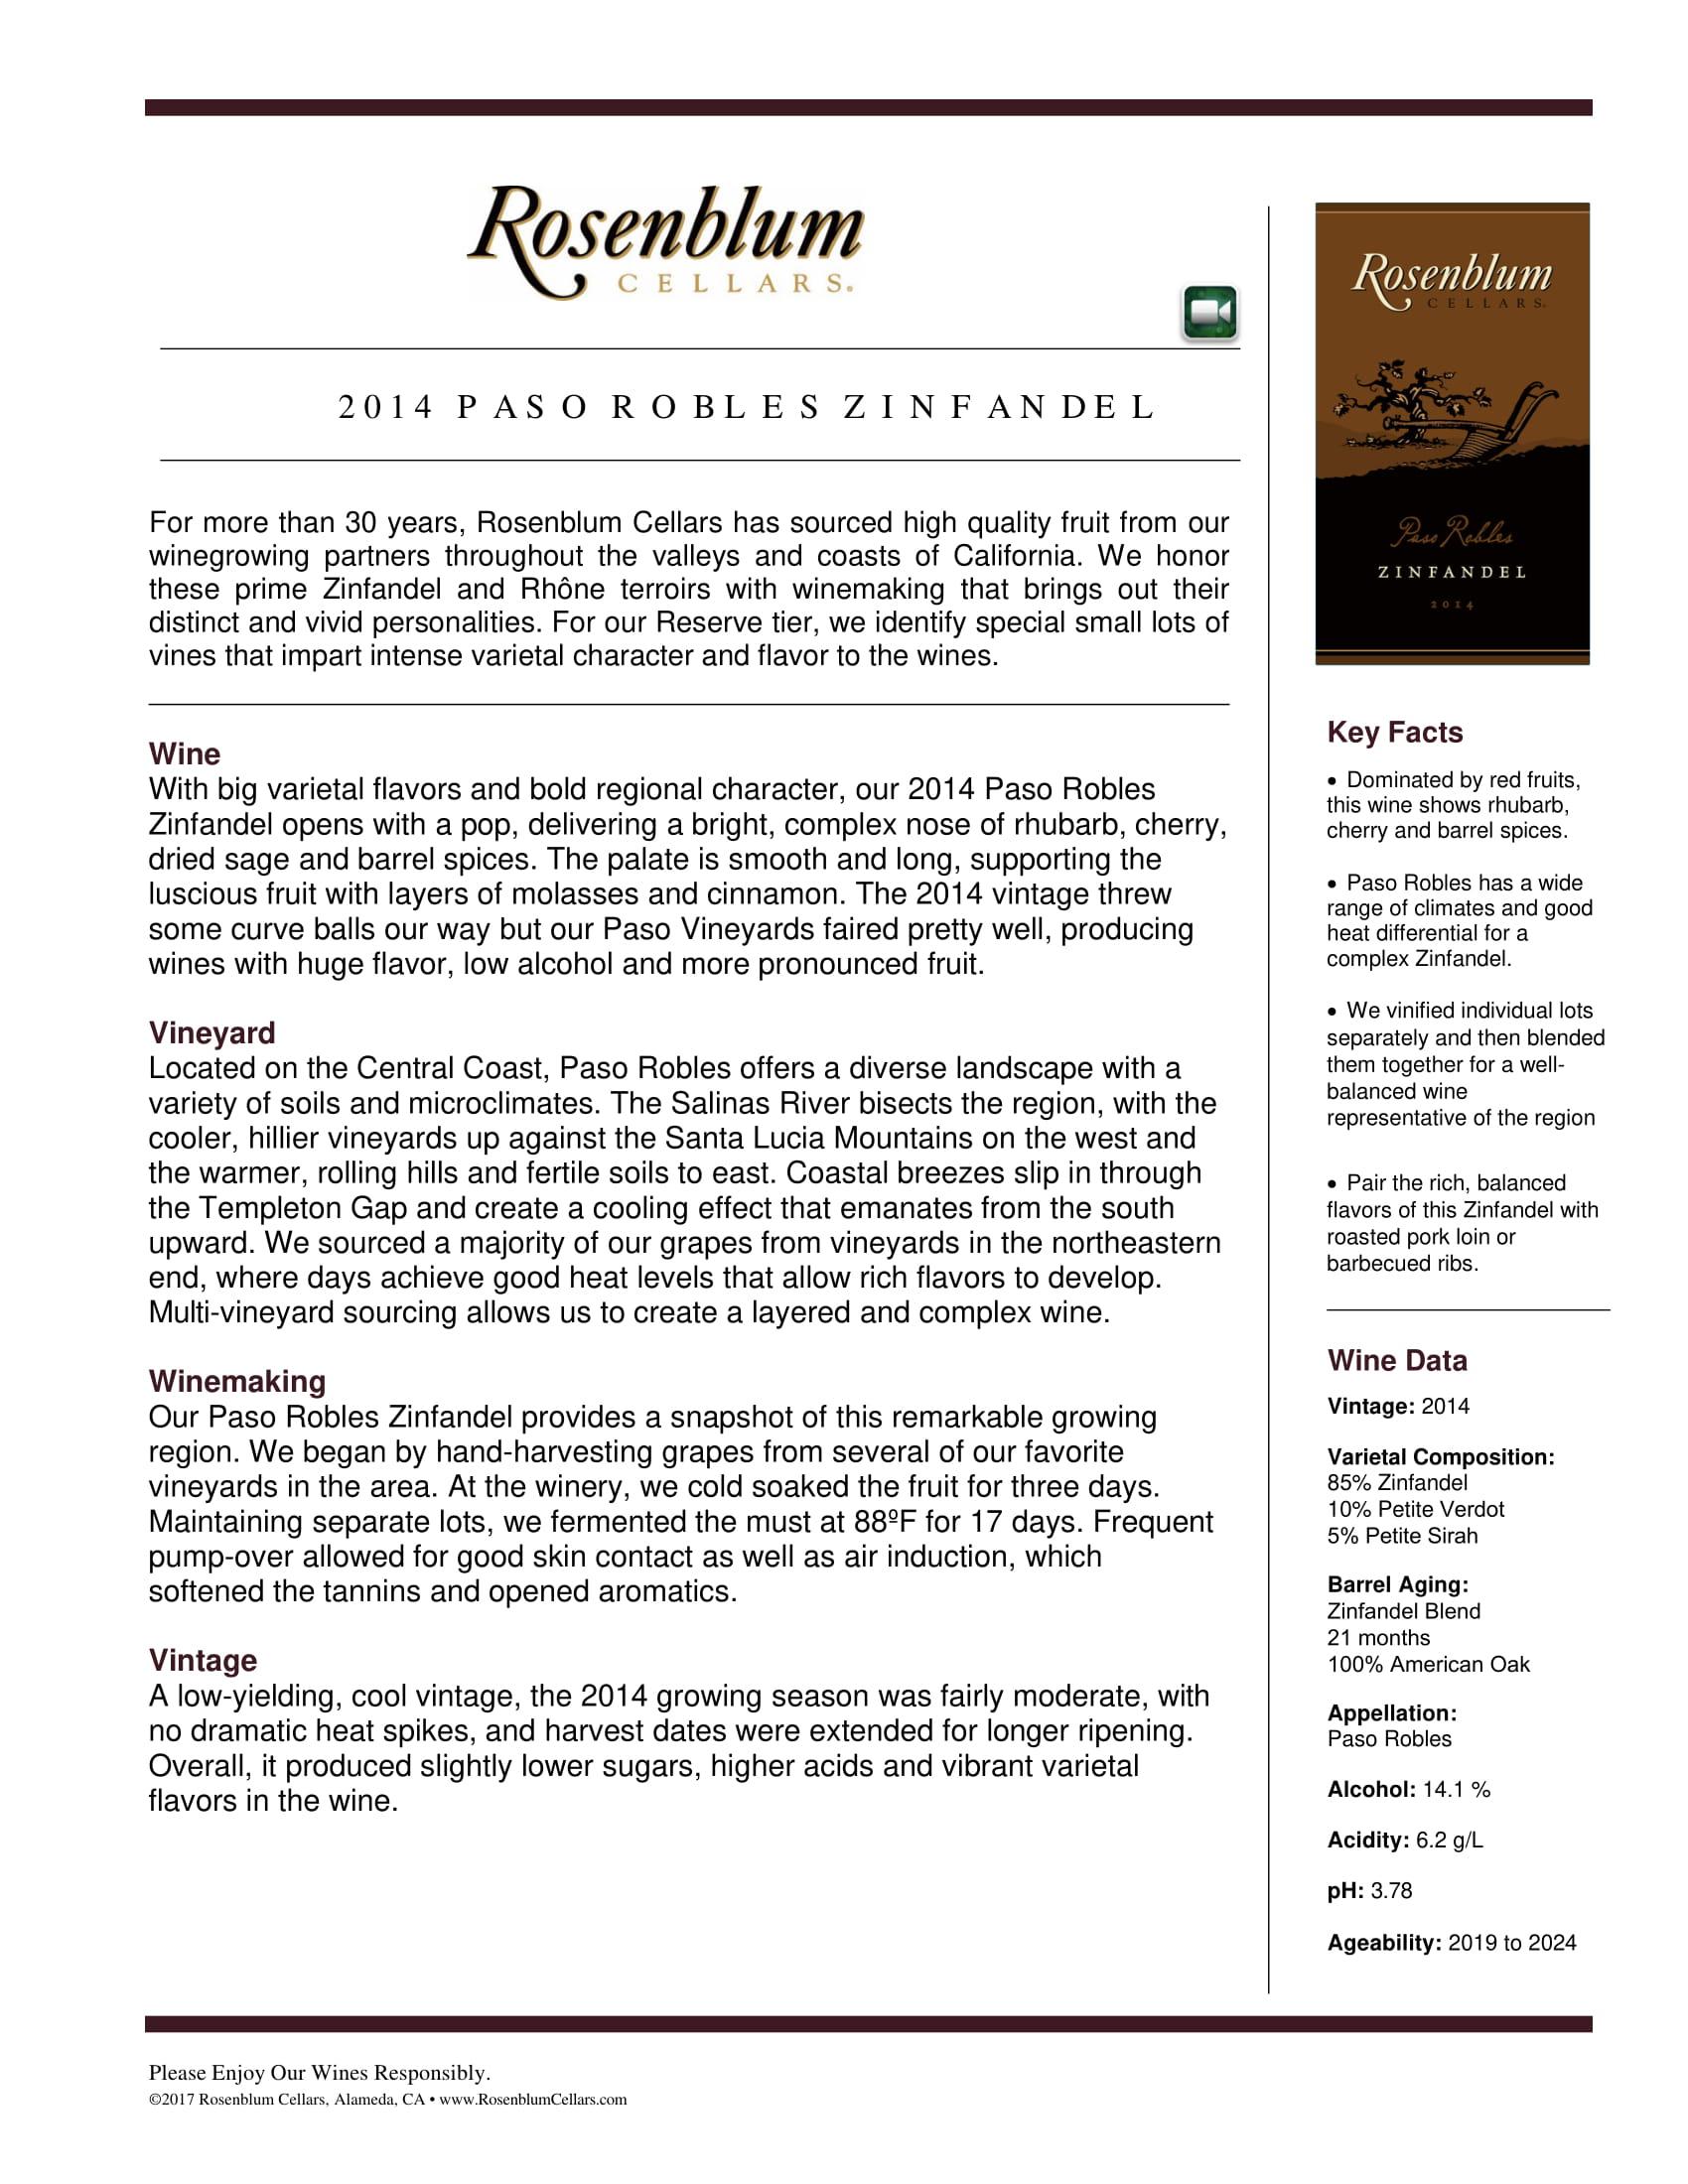 Rosenblum Cellars Zinfandel Paso Robles Tech Sheet